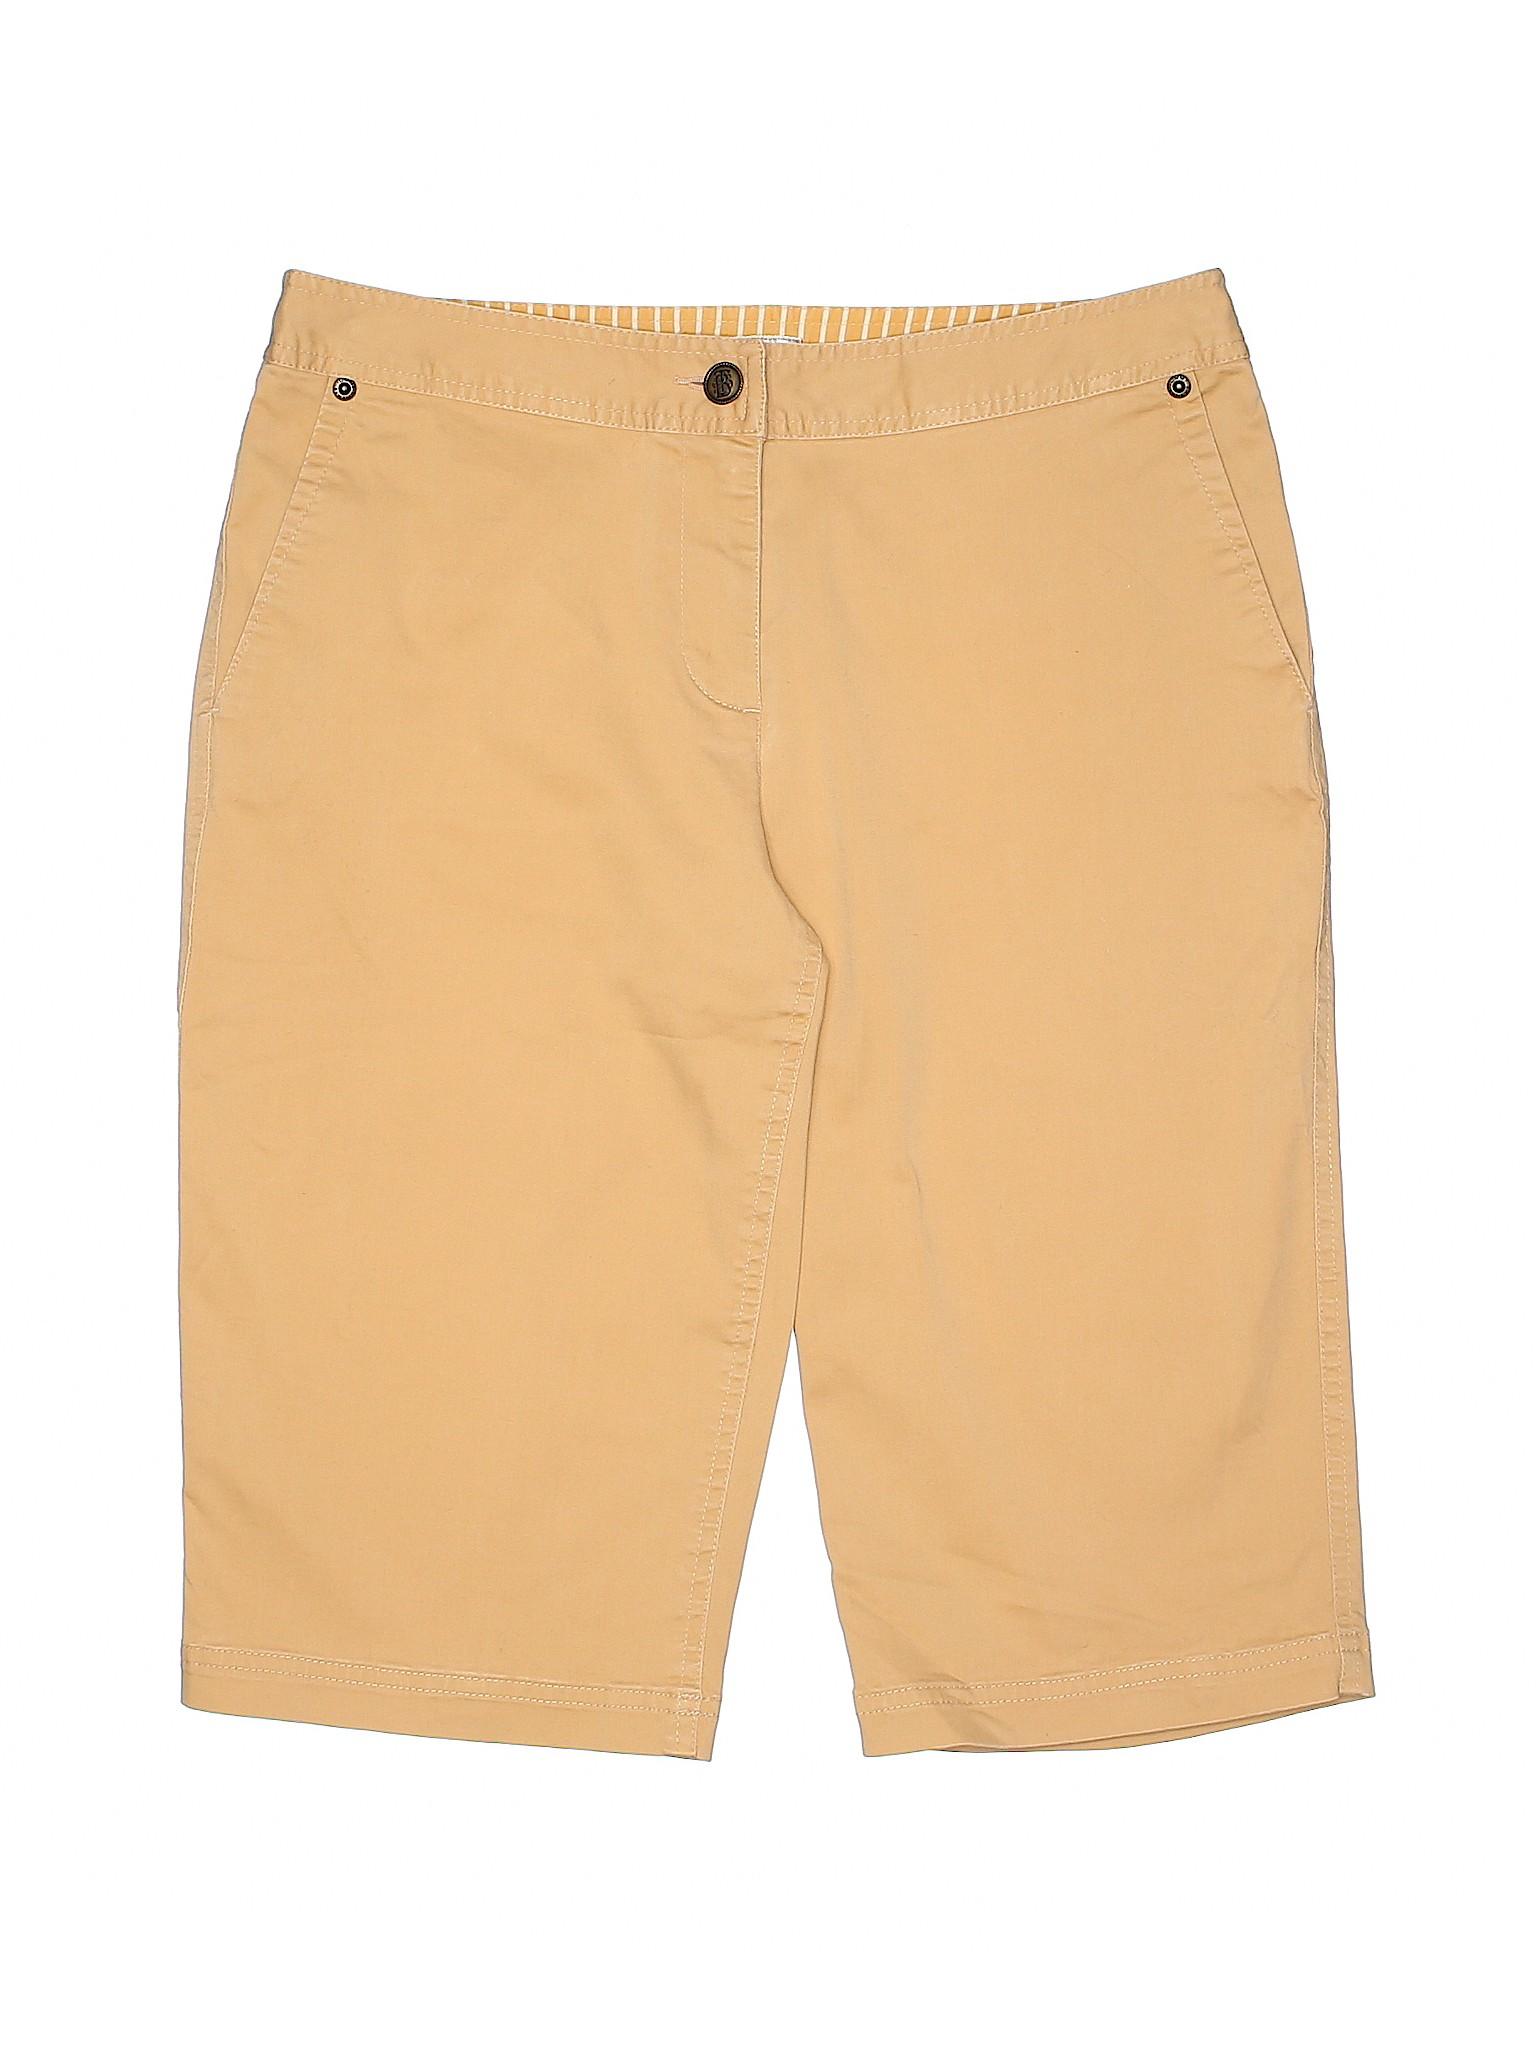 Shorts winter Leisure Khaki Tommy Bahama wPvqXz